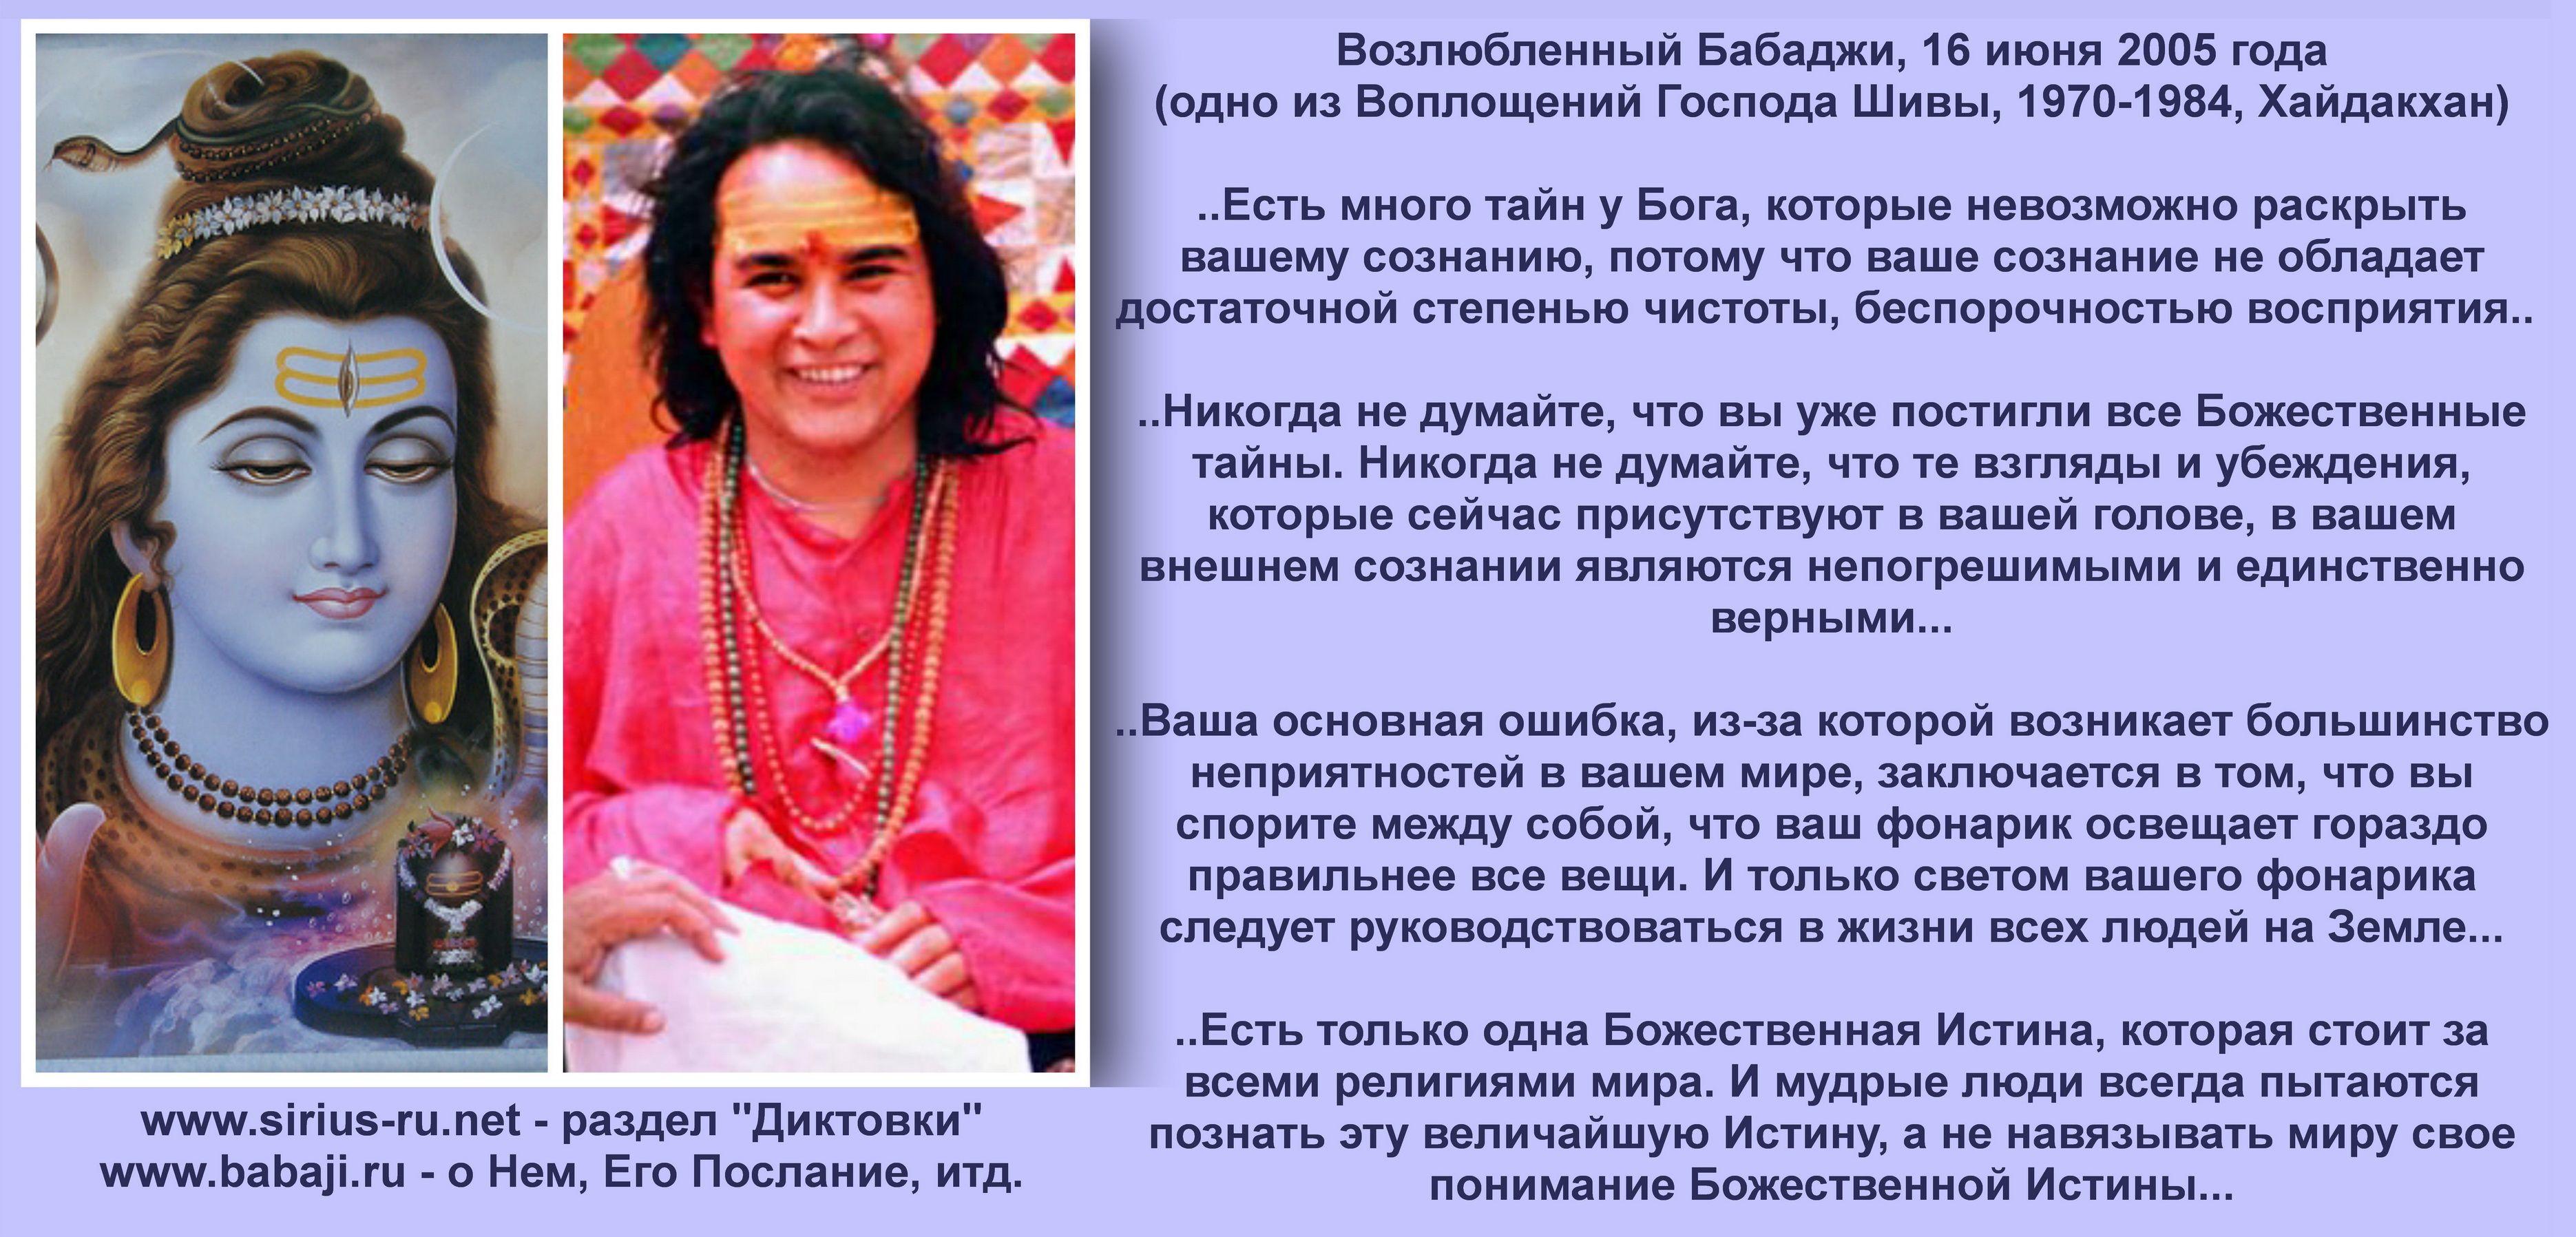 Sirius-ru.net деньги киви